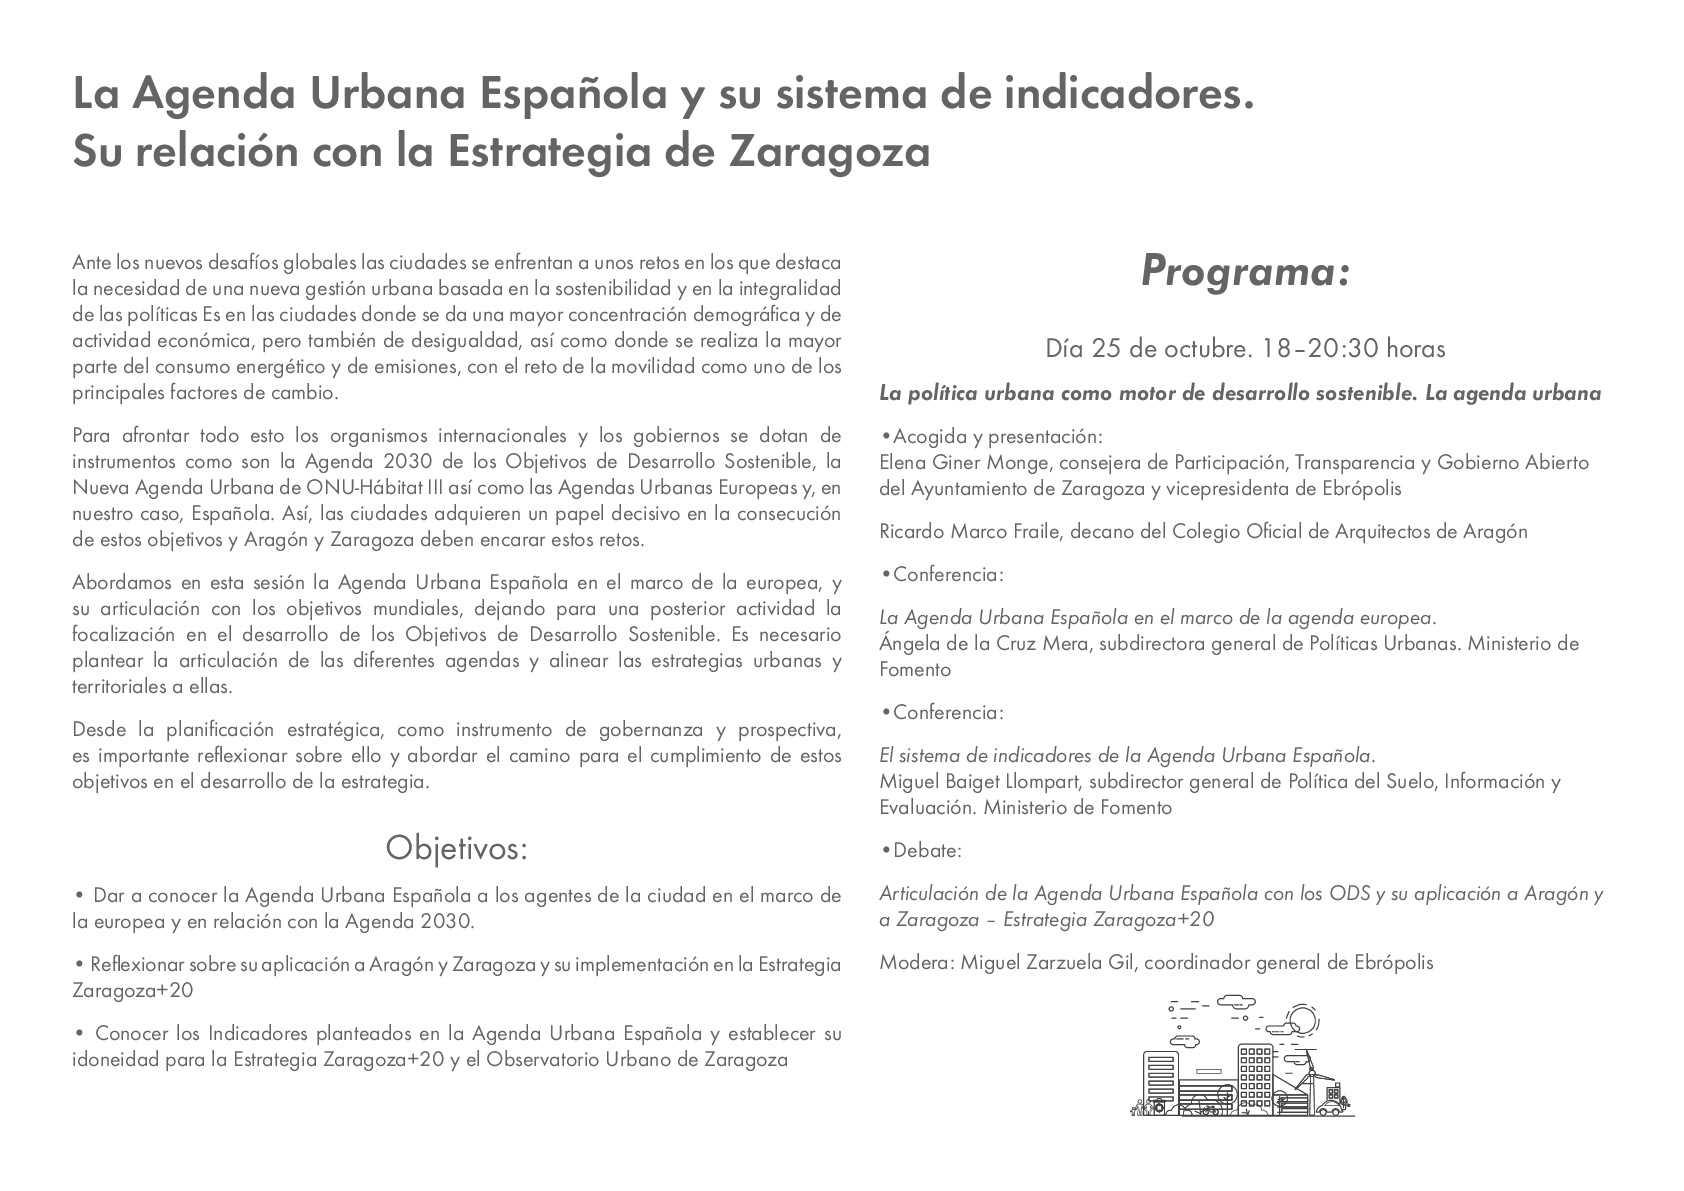 folleto-jornada-agenda-urbana-002.jpg